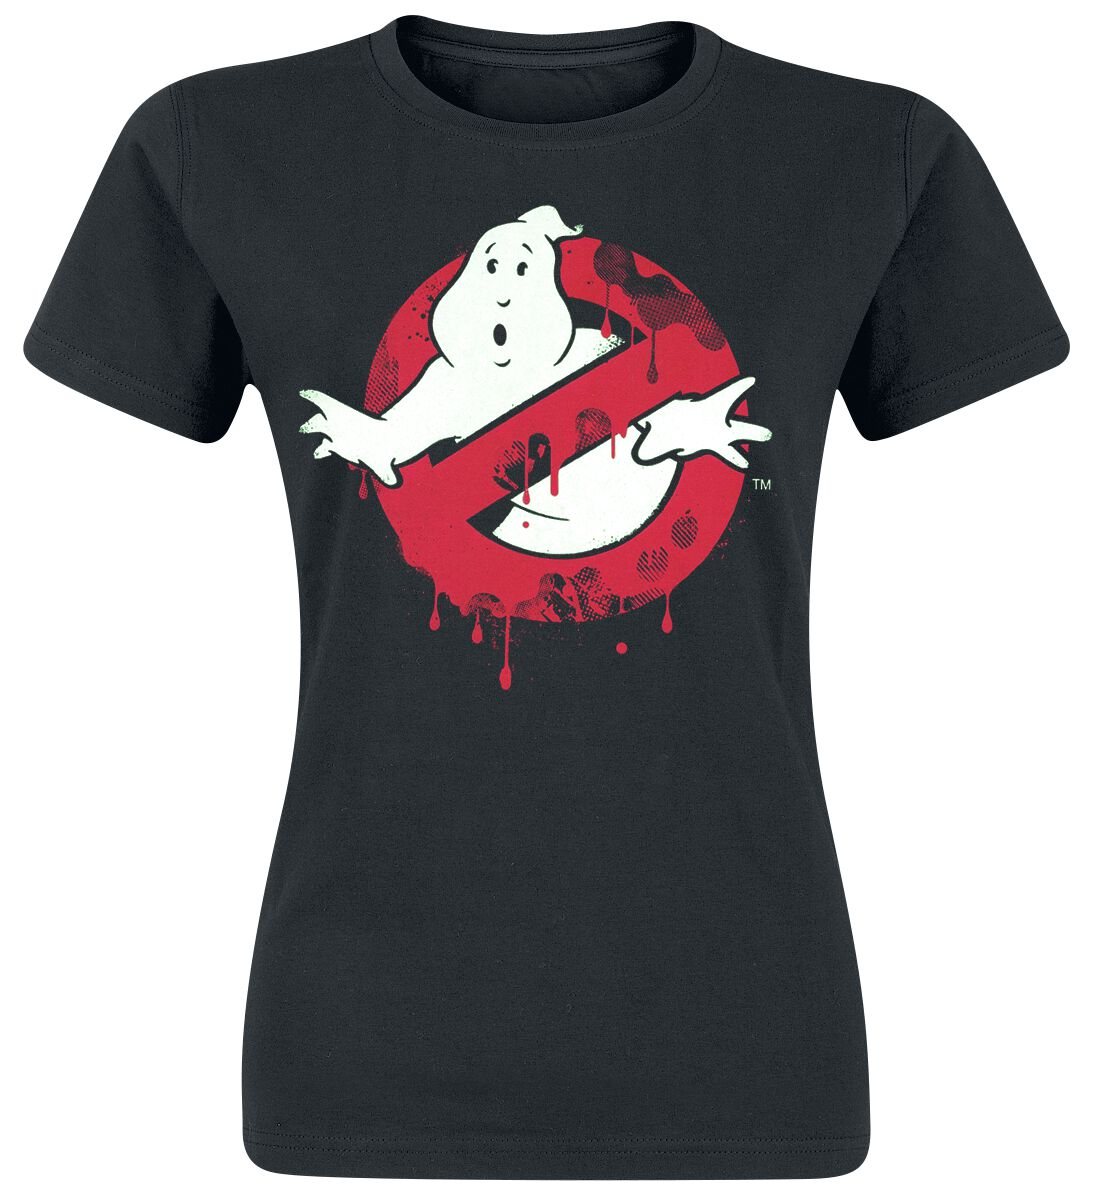 Merch dla Fanów - Koszulki - Koszulka damska Ghostbusters Logo Koszulka damska czarny - 371722